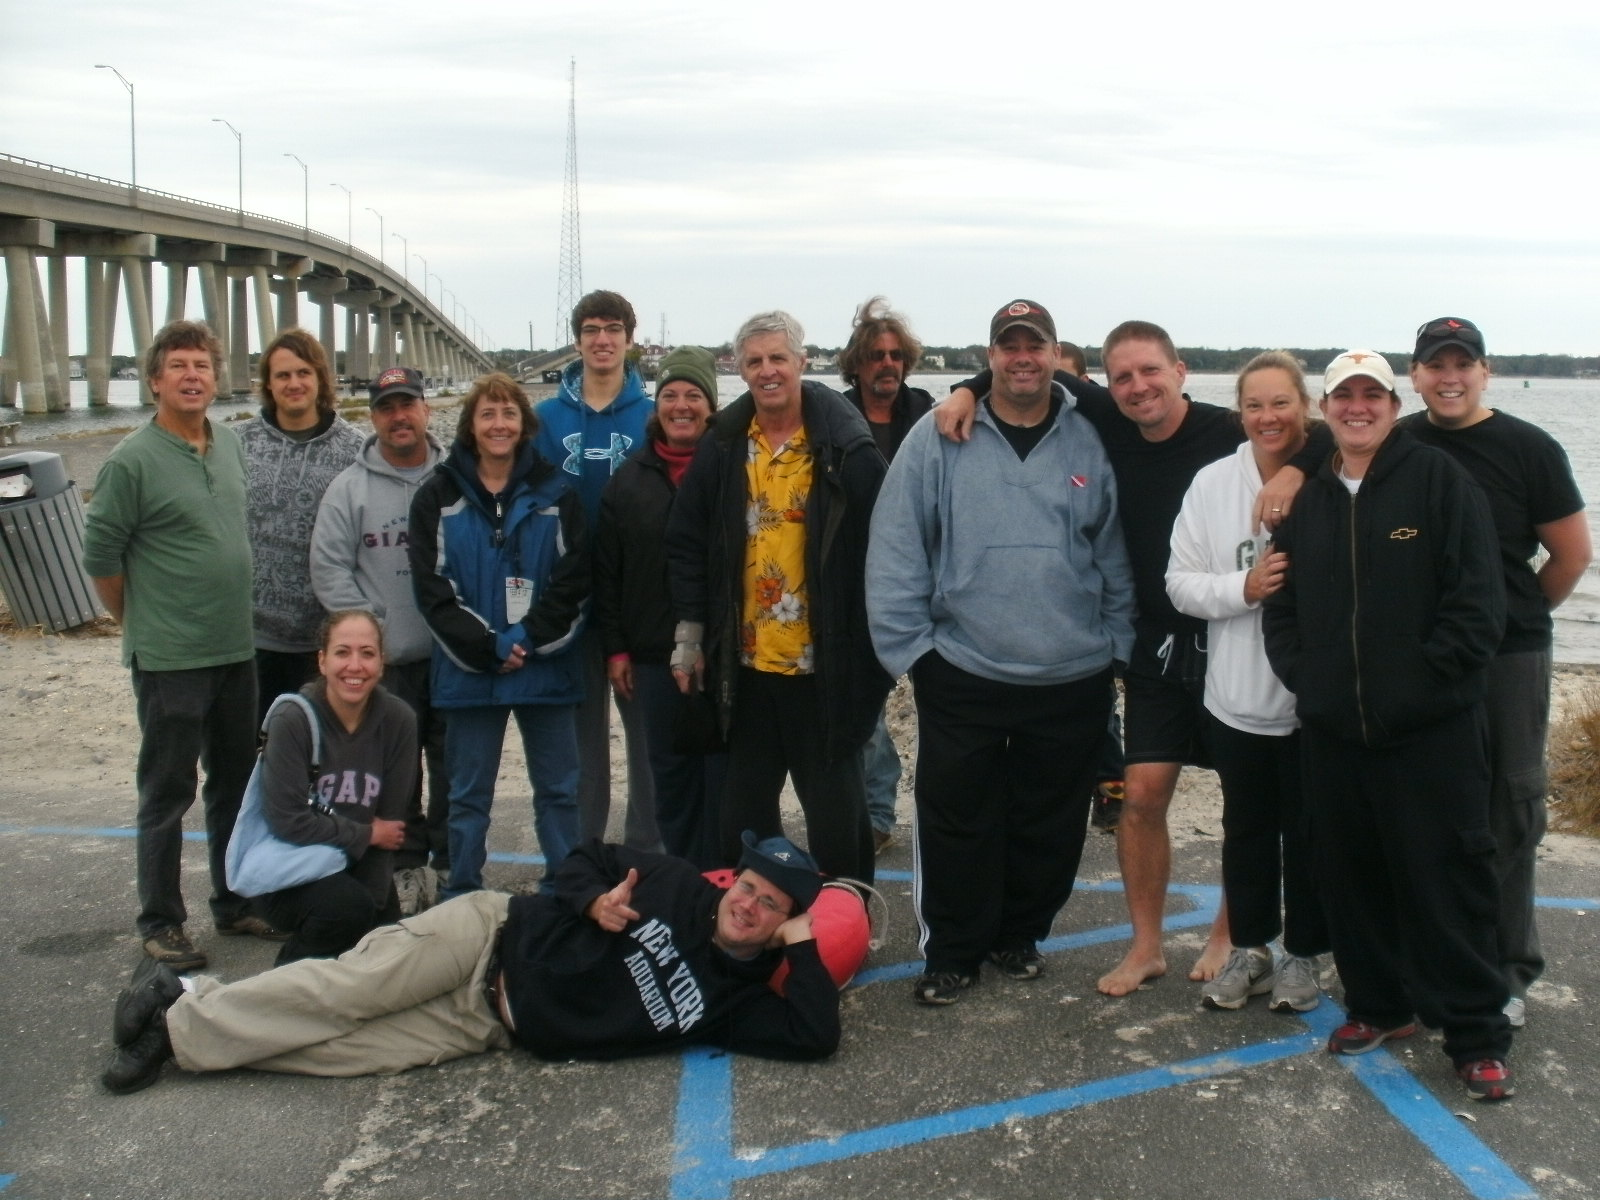 Tiedemann's Diving Center Club Dive - October 7, 2012